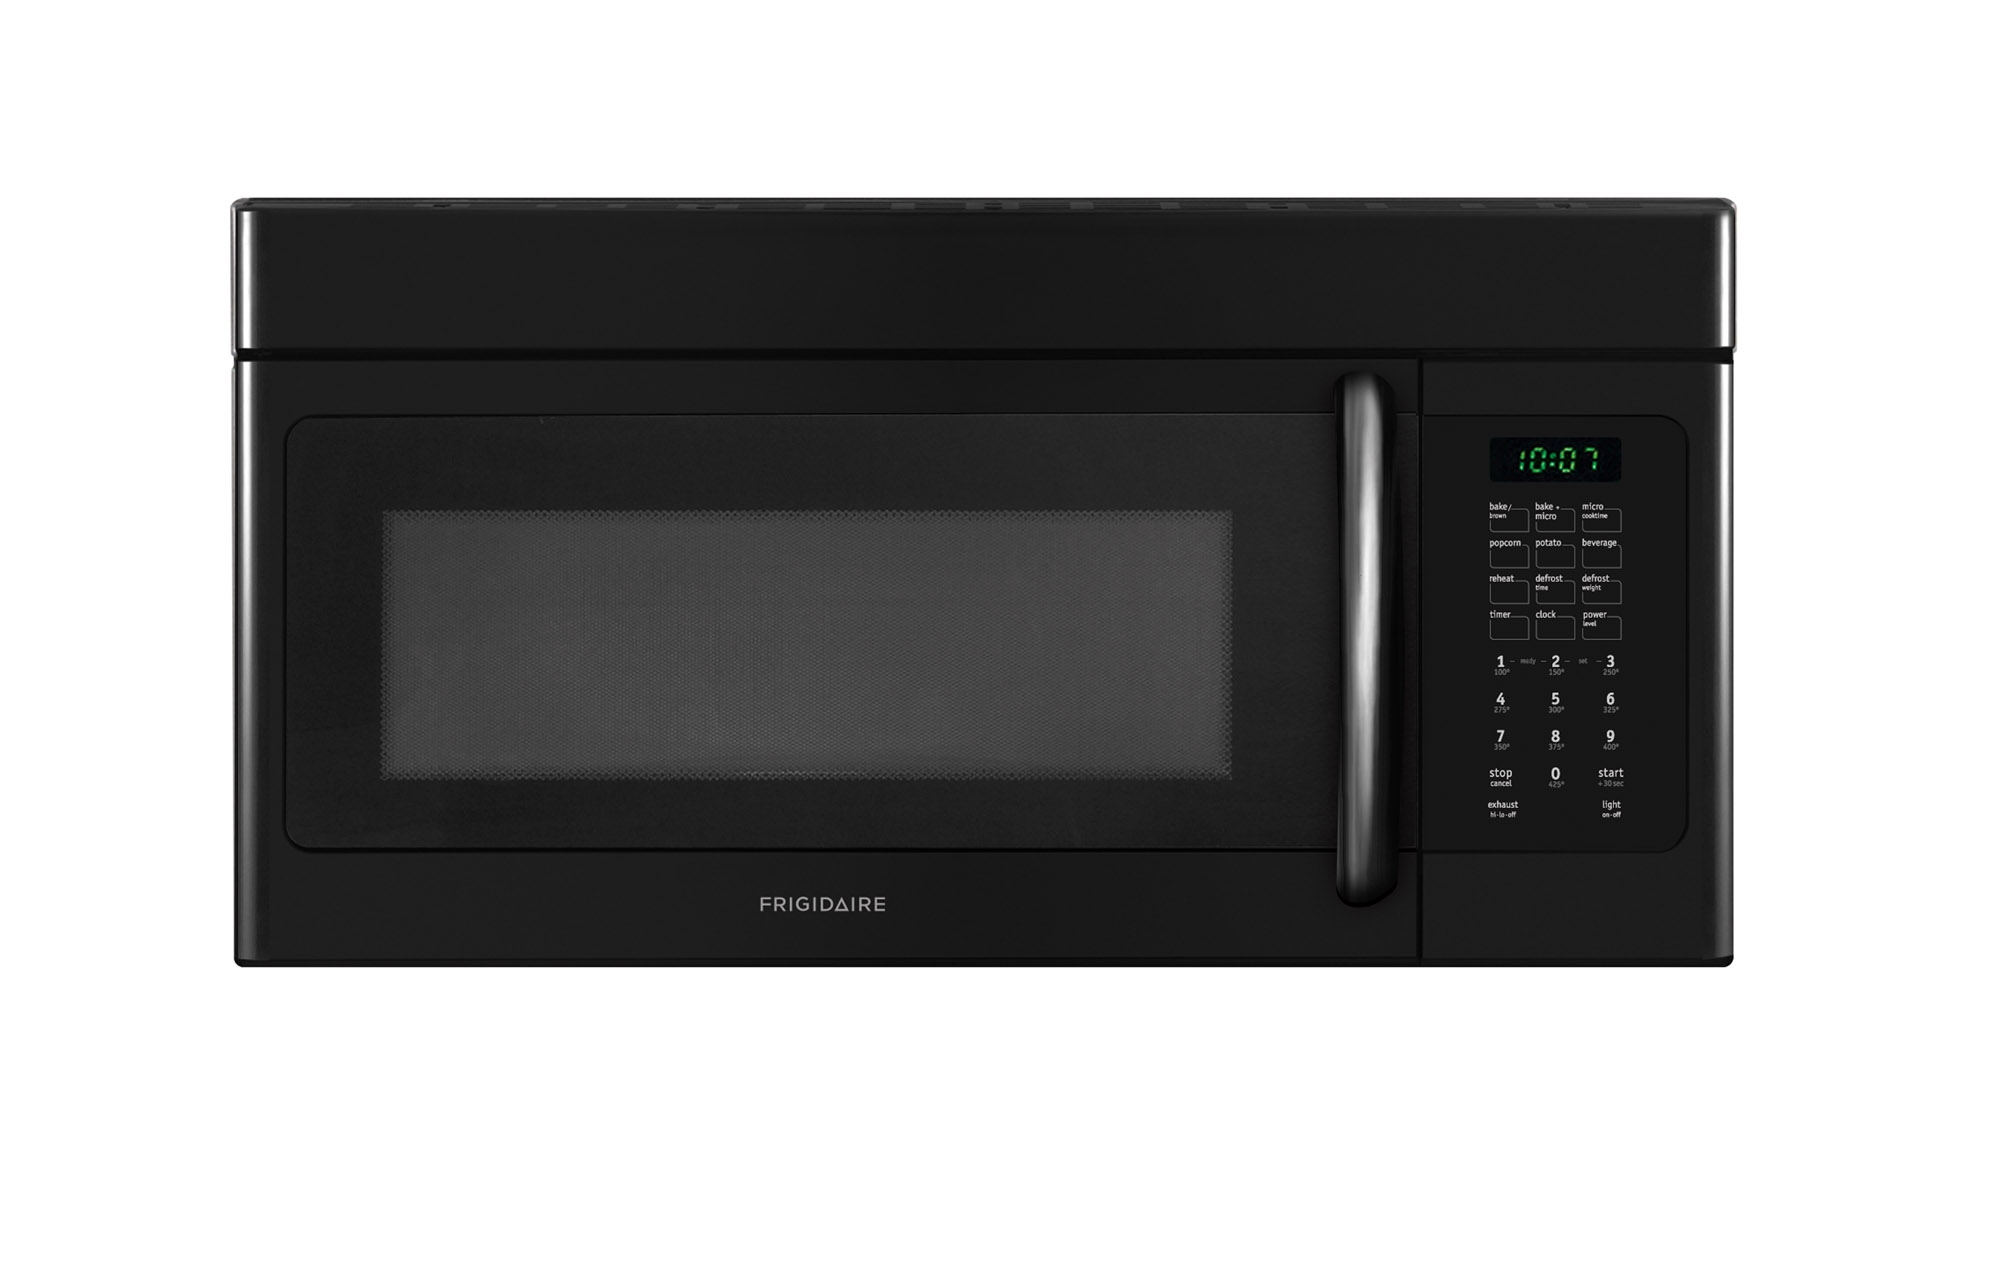 Frigidaire Ffmv152clb 1 5 Cu Ft Over The Range Microwave